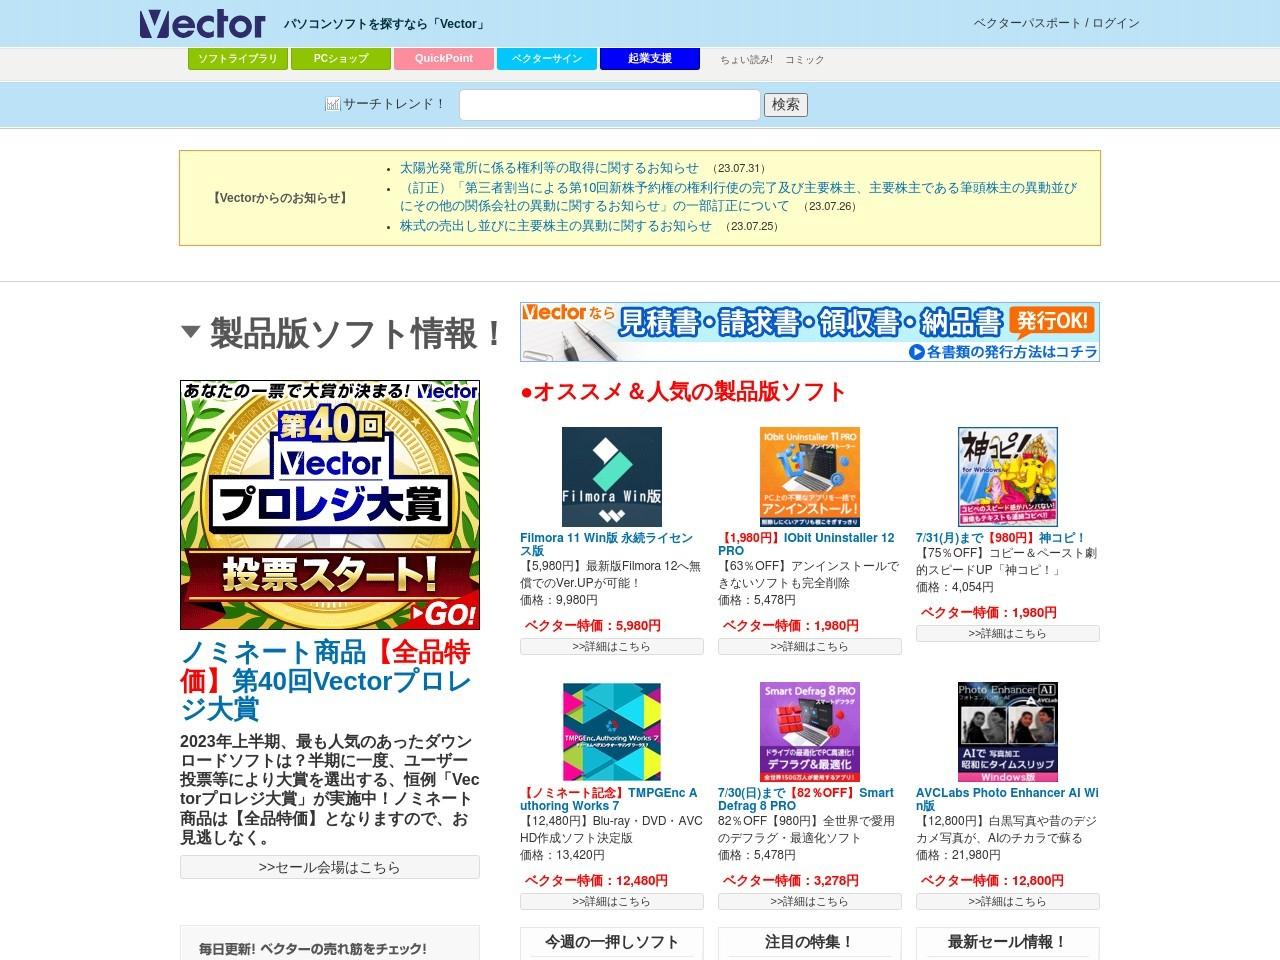 http://www.vector.co.jp/soft/winnt/writing/se492489.html